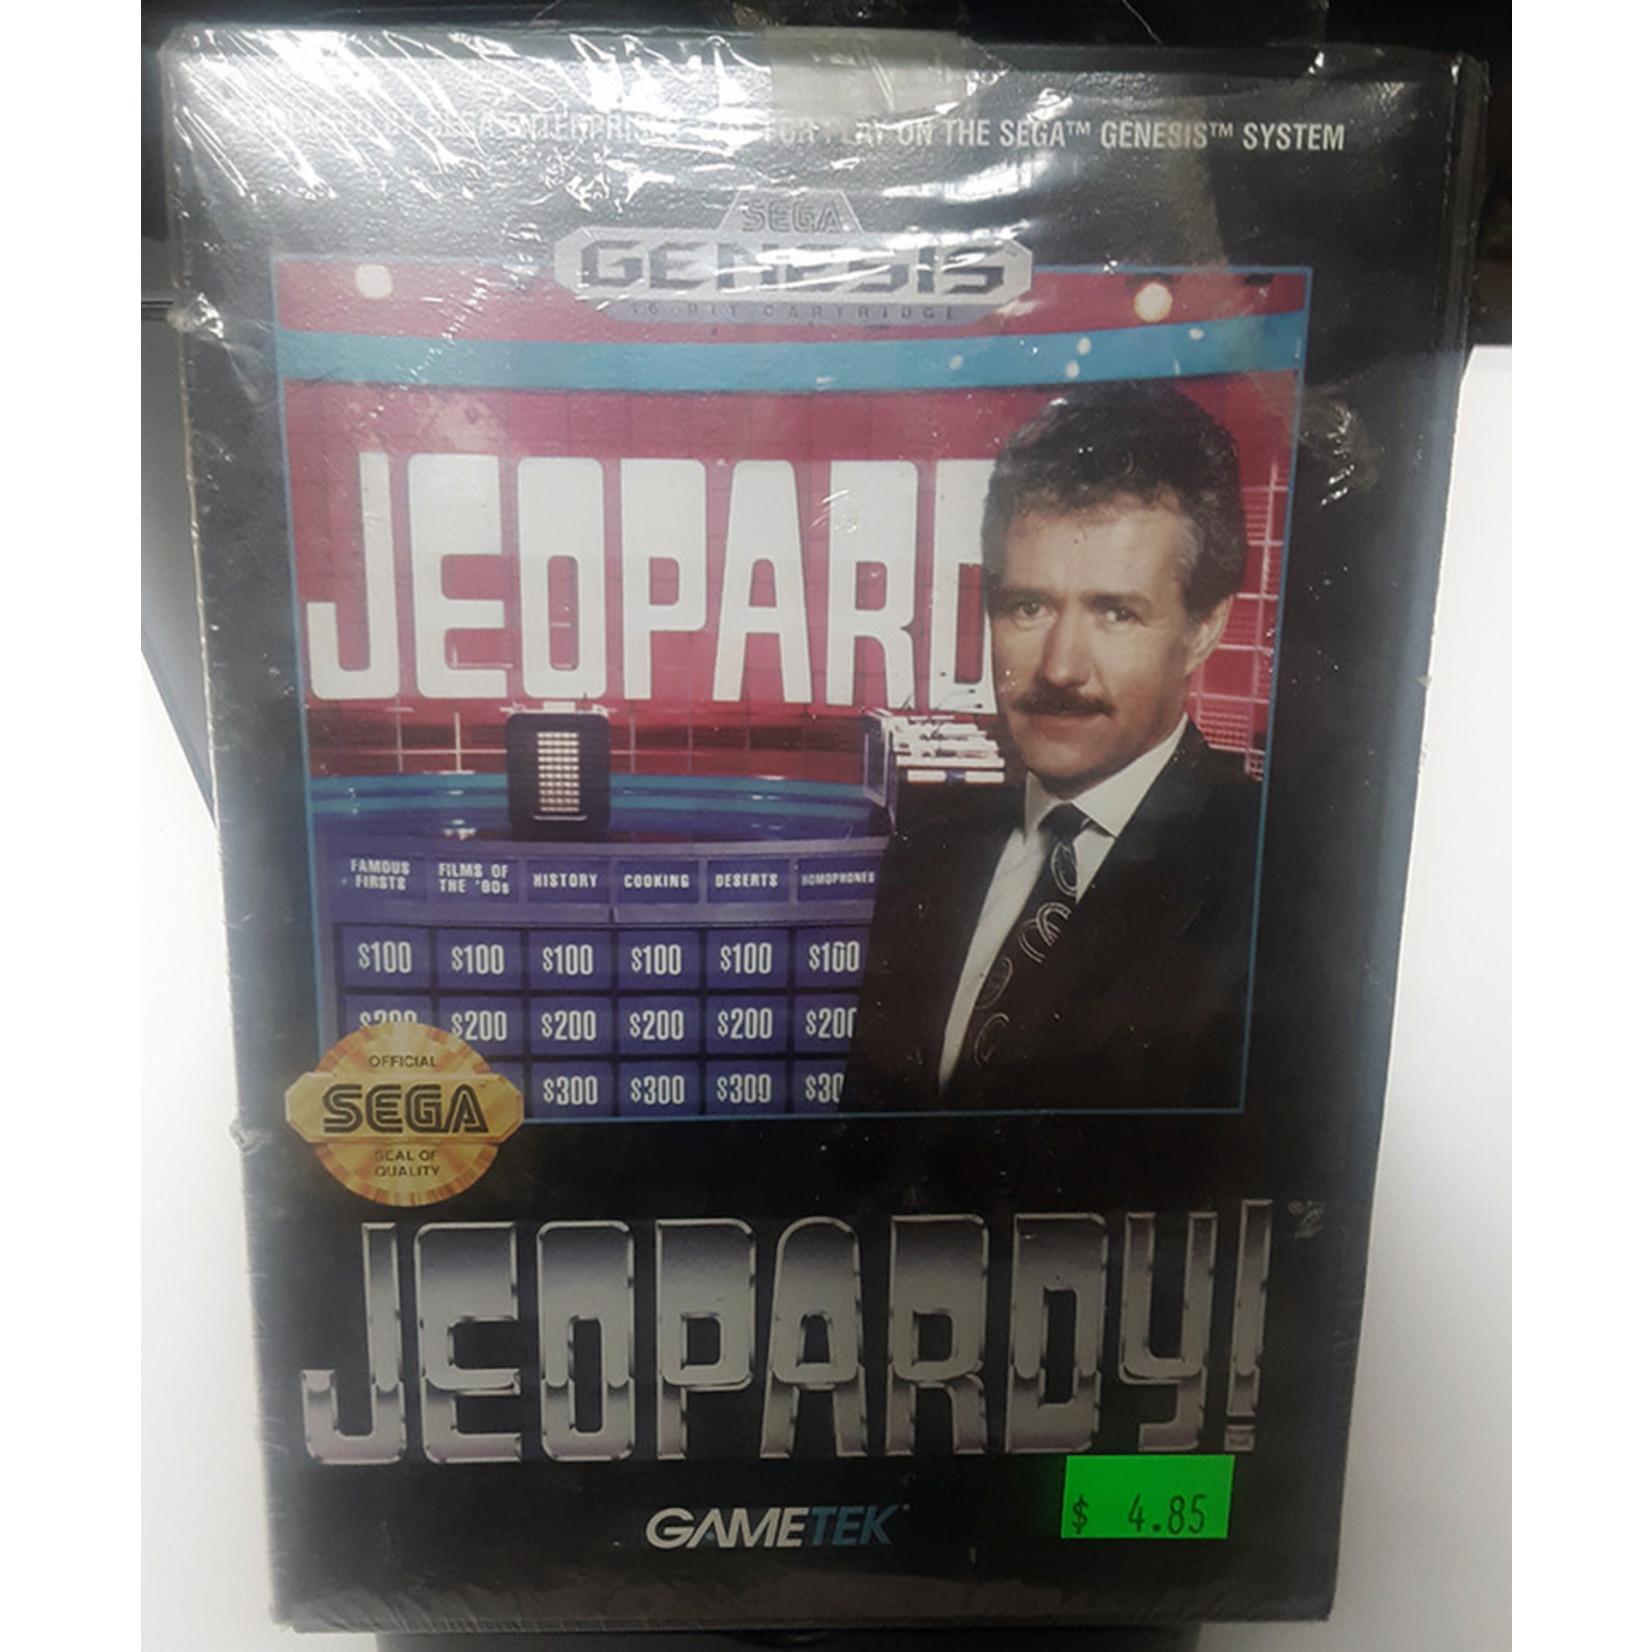 sgu-jeopardy (in box)